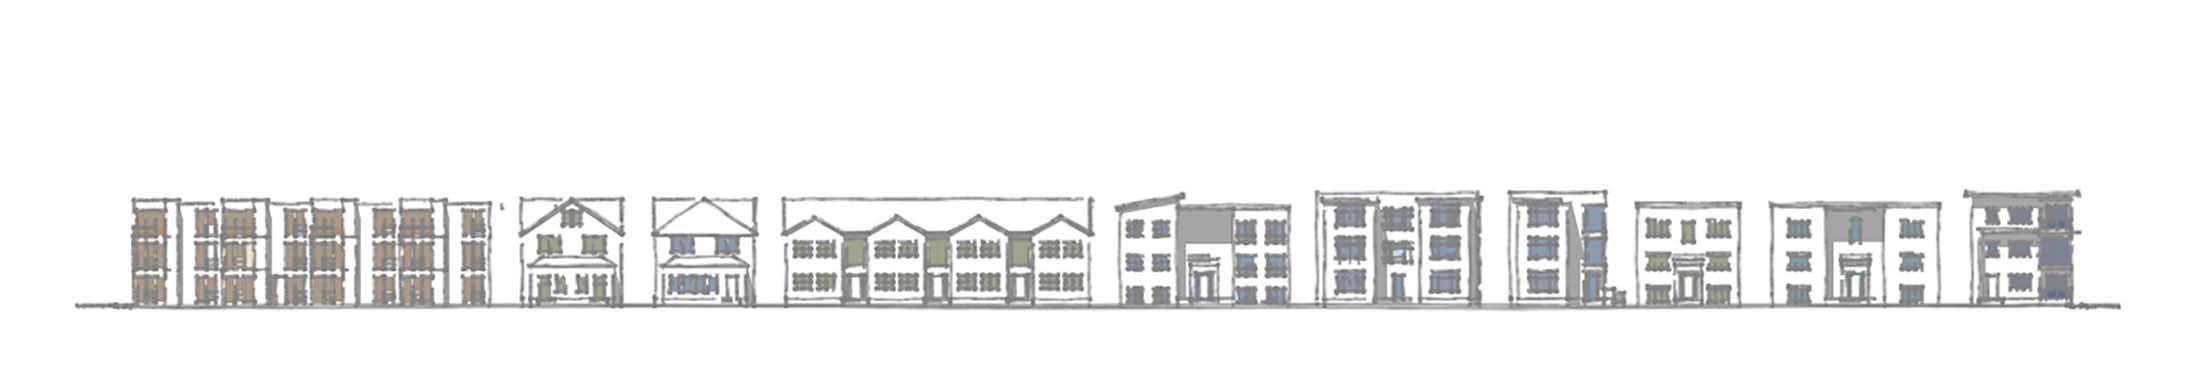 Elevation rendering of Interior 3